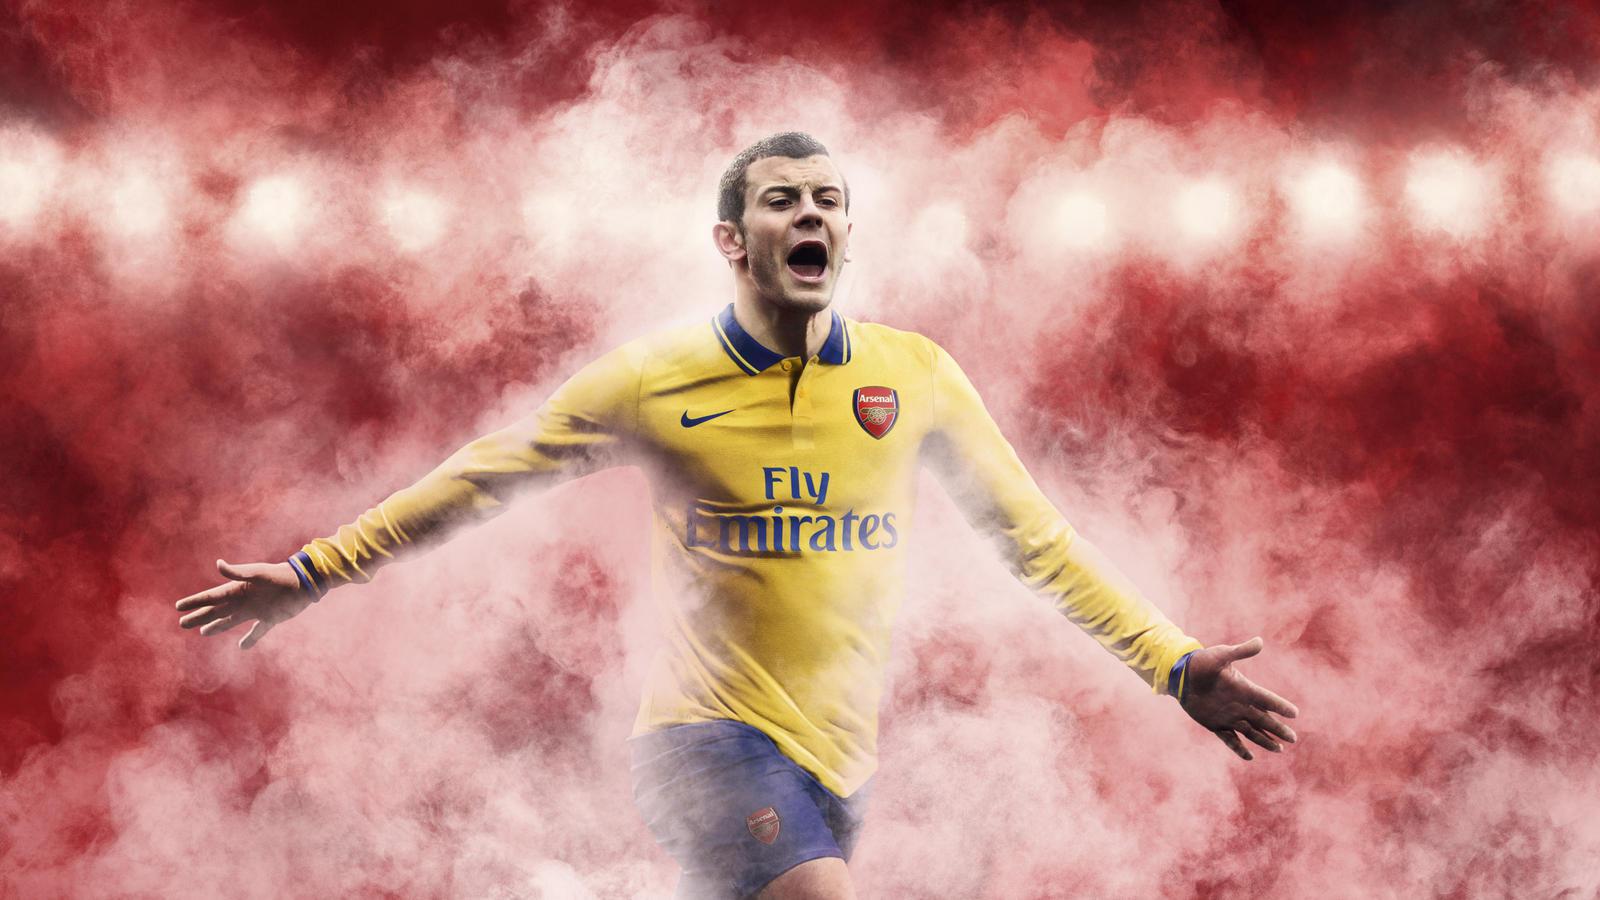 Jack Wilshere in new Arsenal Away Shirt 2013-14